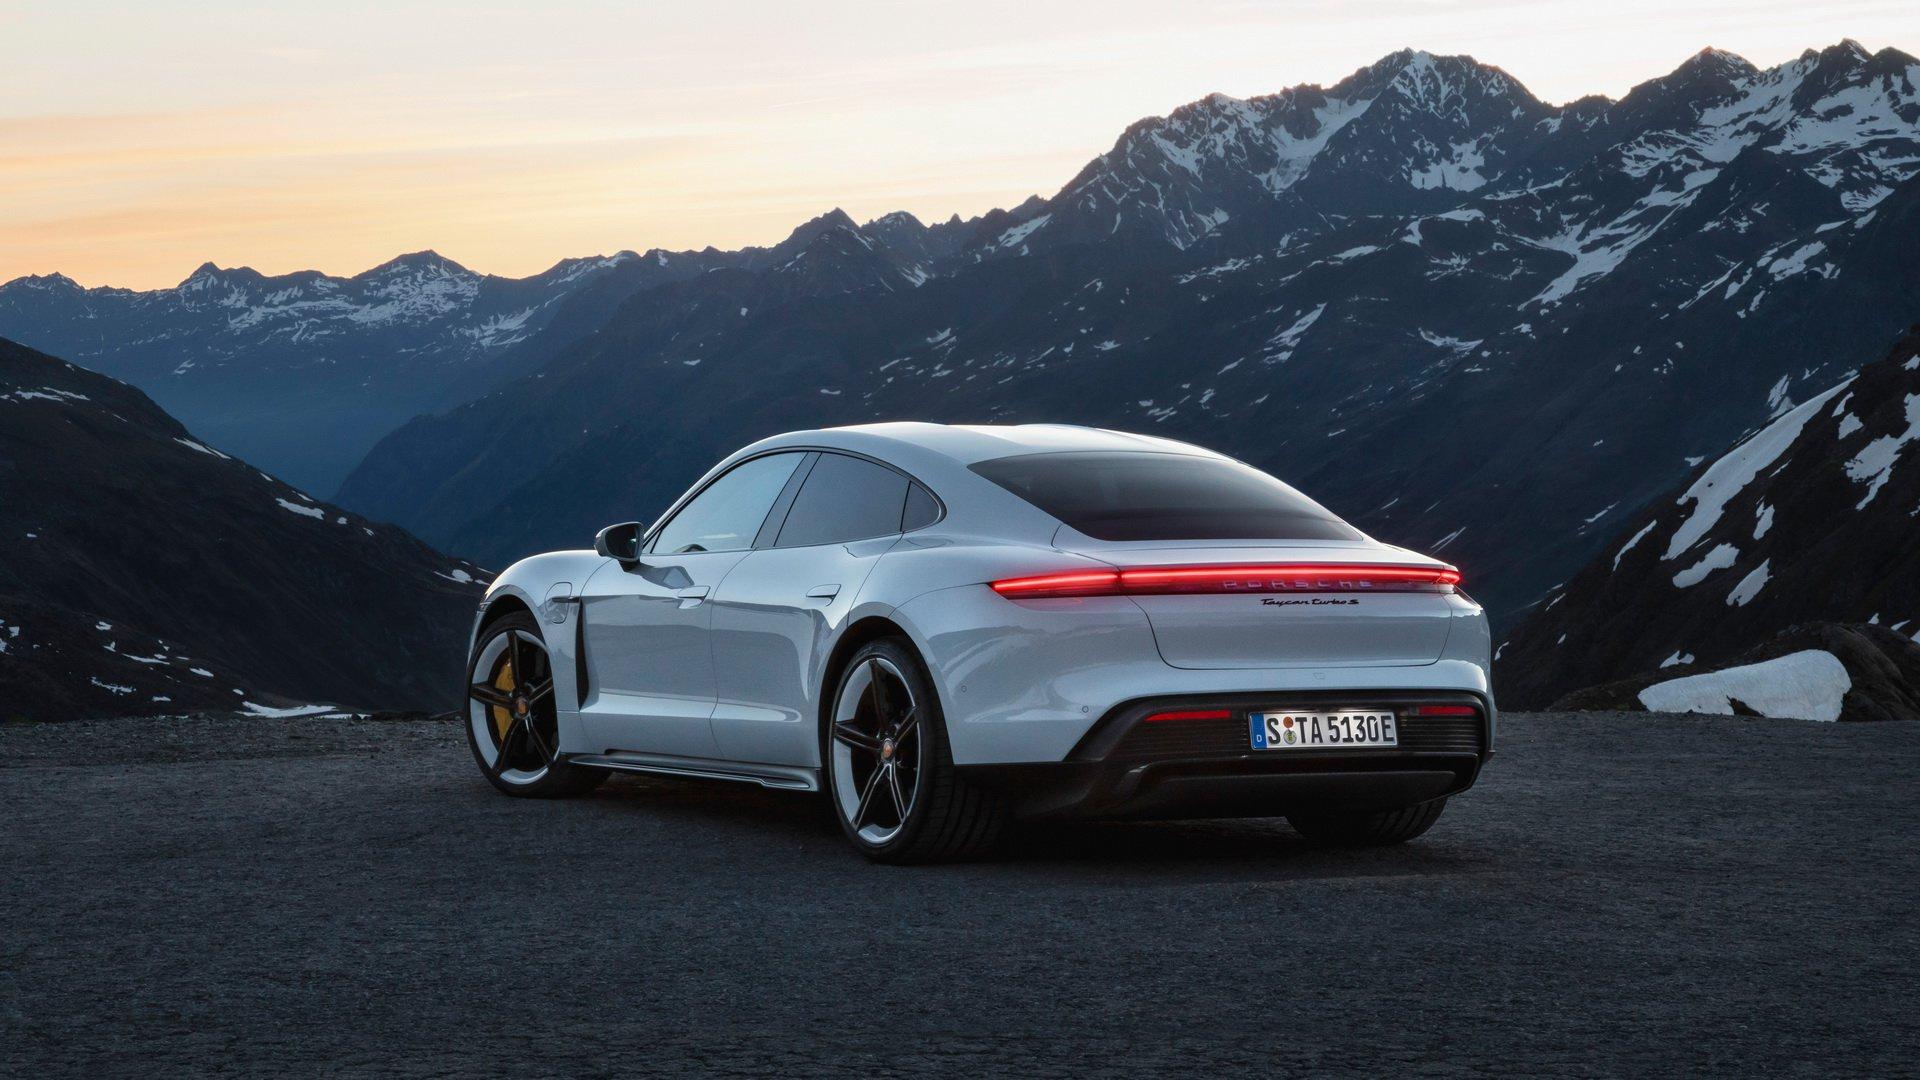 Porsche официально представили конкурента Теслы